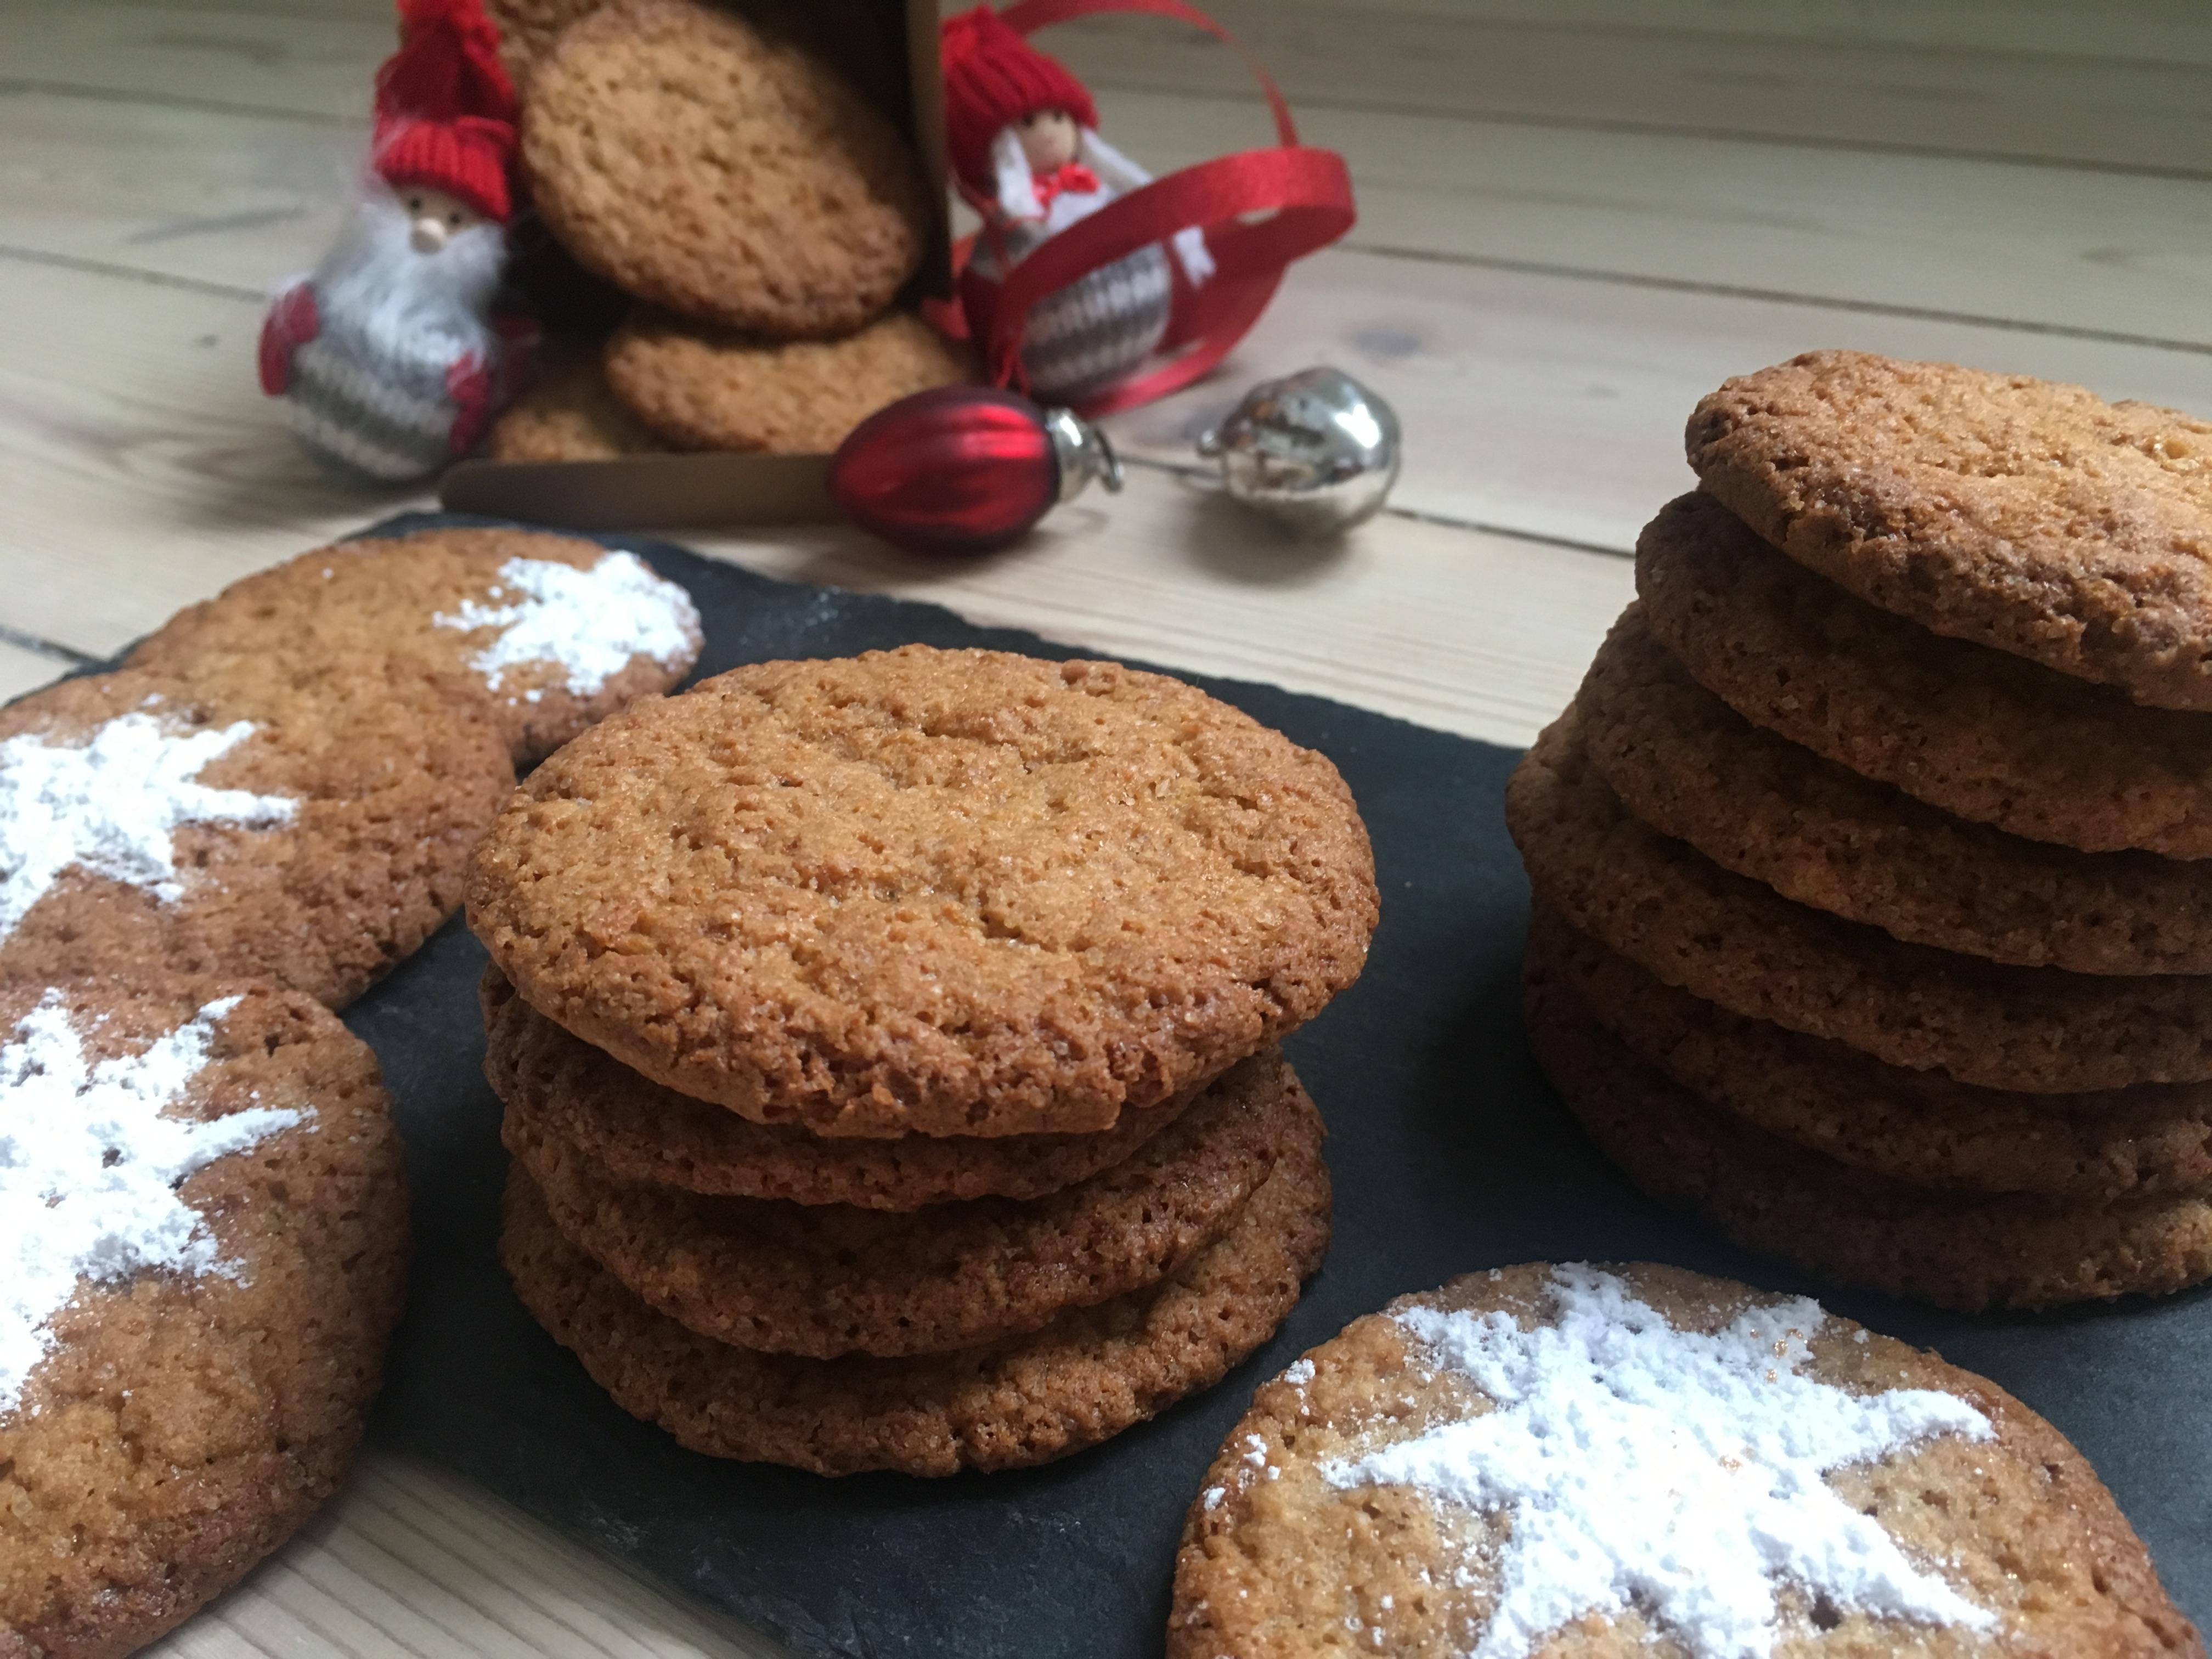 Ingefær småkager, glutenfri og mælkefri